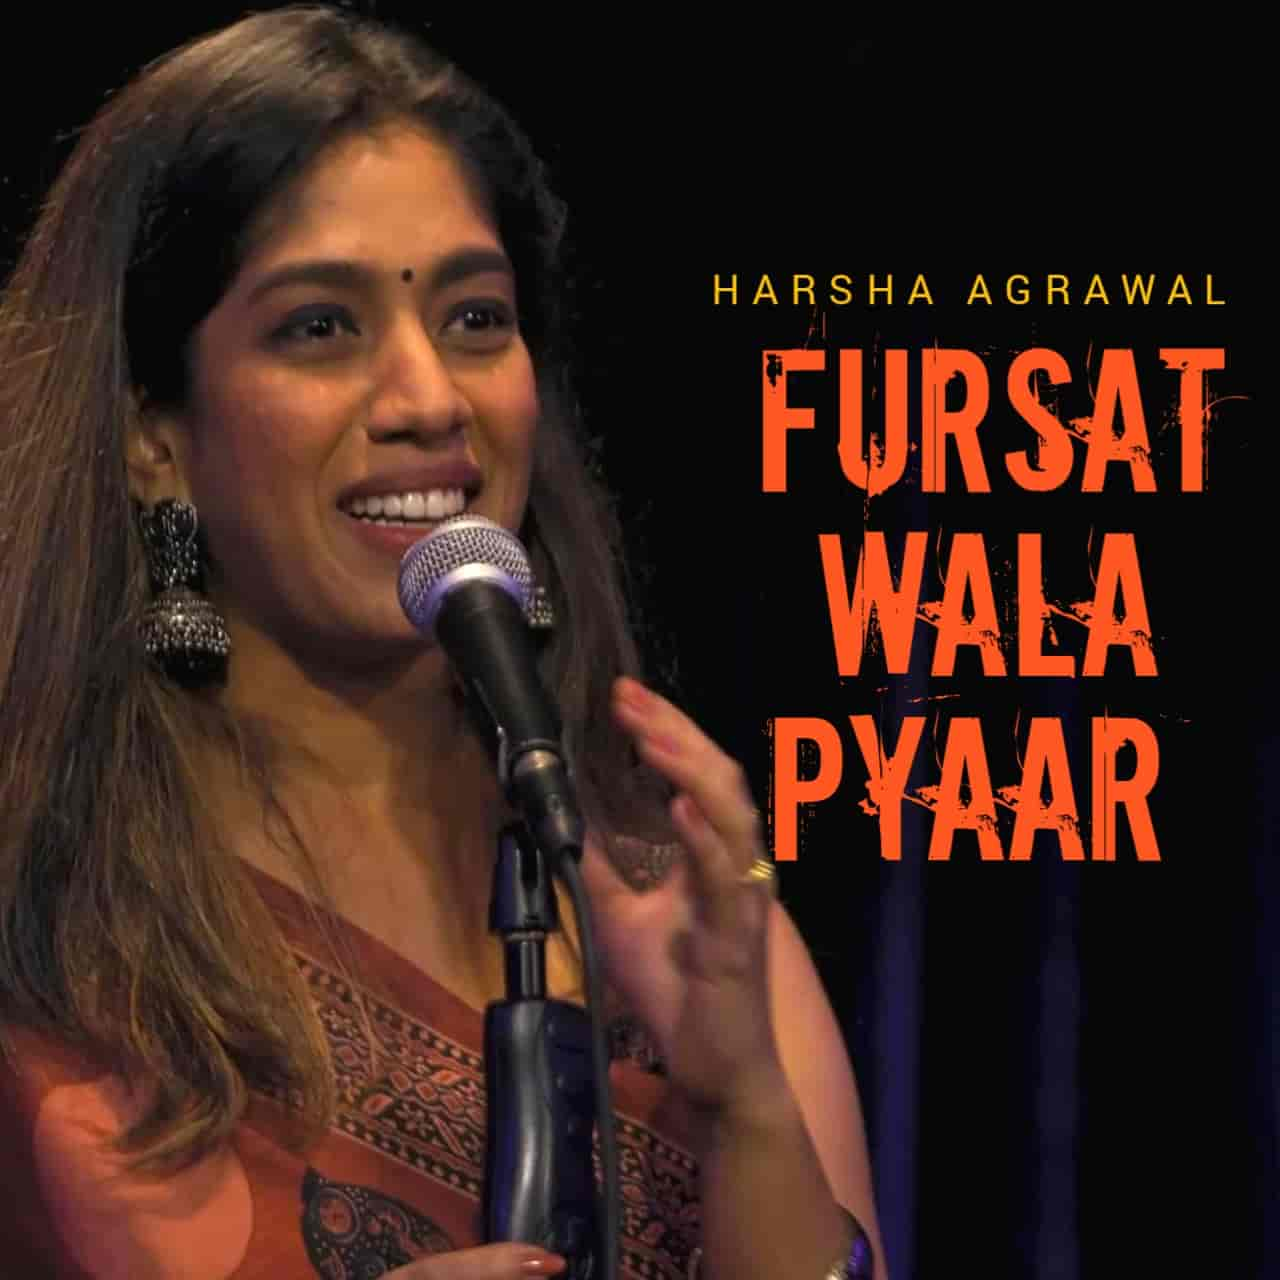 Fursat Wala Pyaar Poetry, Written By Harsha Agrawal.